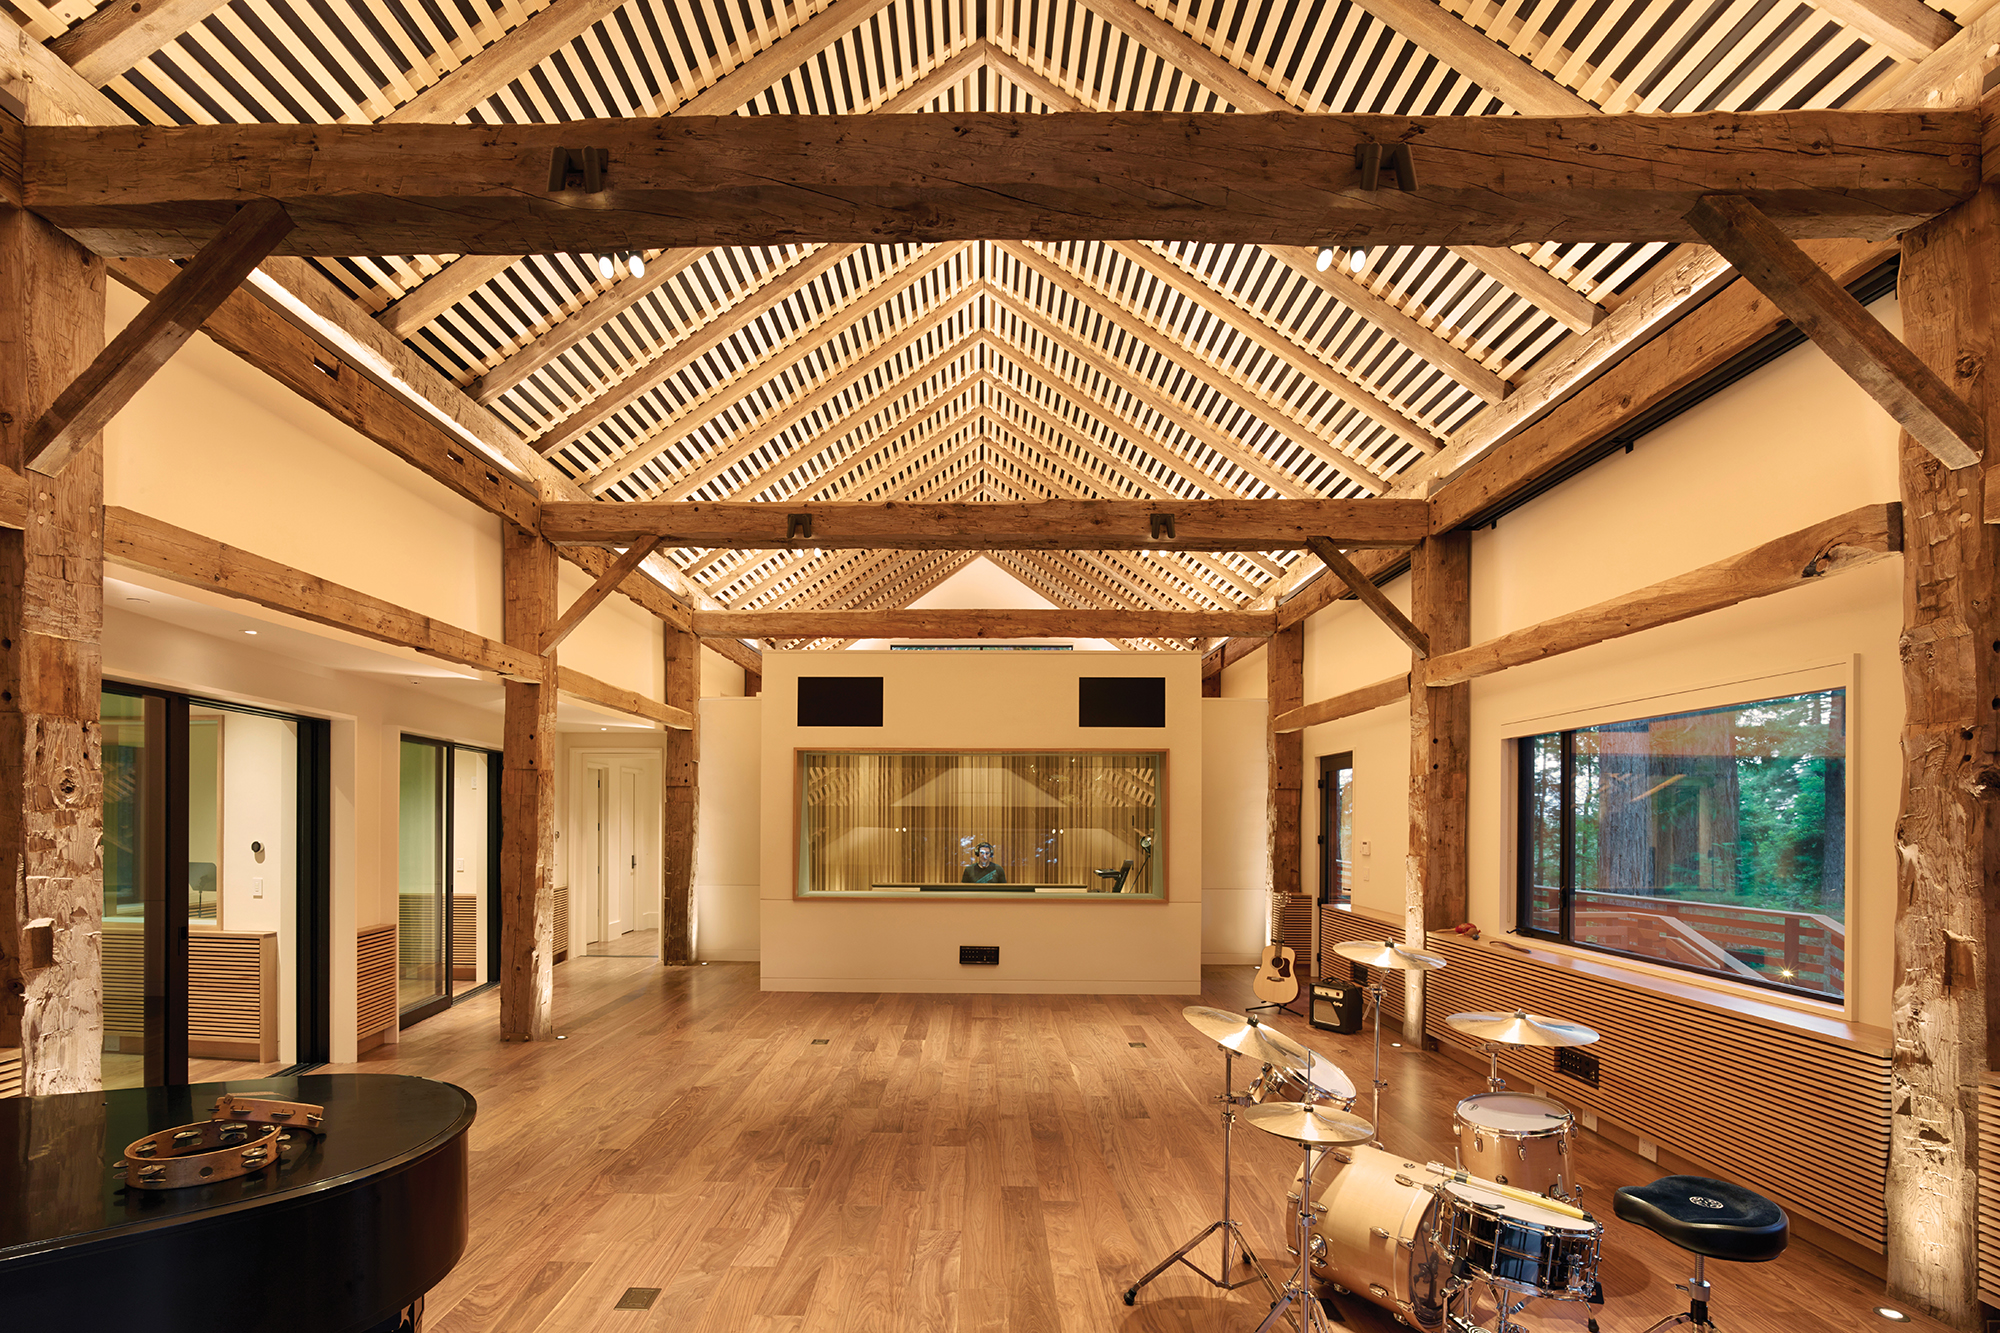 Interior design home recording studio - Sonoma Recording Studio Architectural Lighting Magazine Cultural Projects Lighting Design Pritchardpeck Ge Lighting Lucifer Lighting Lutron